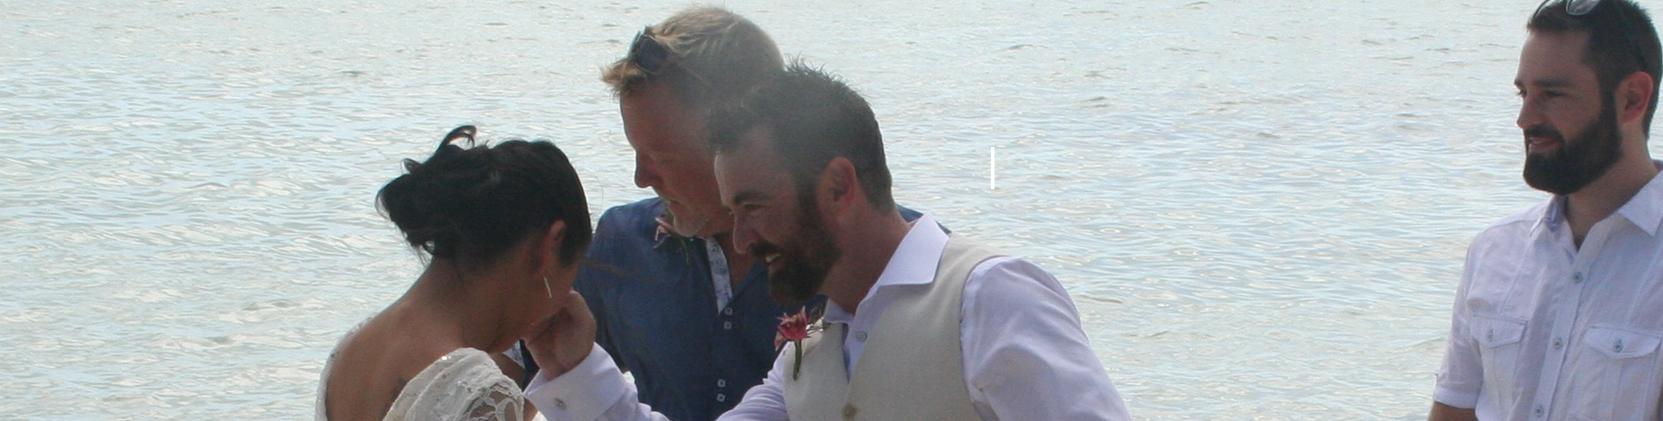 Keewaydin wedding